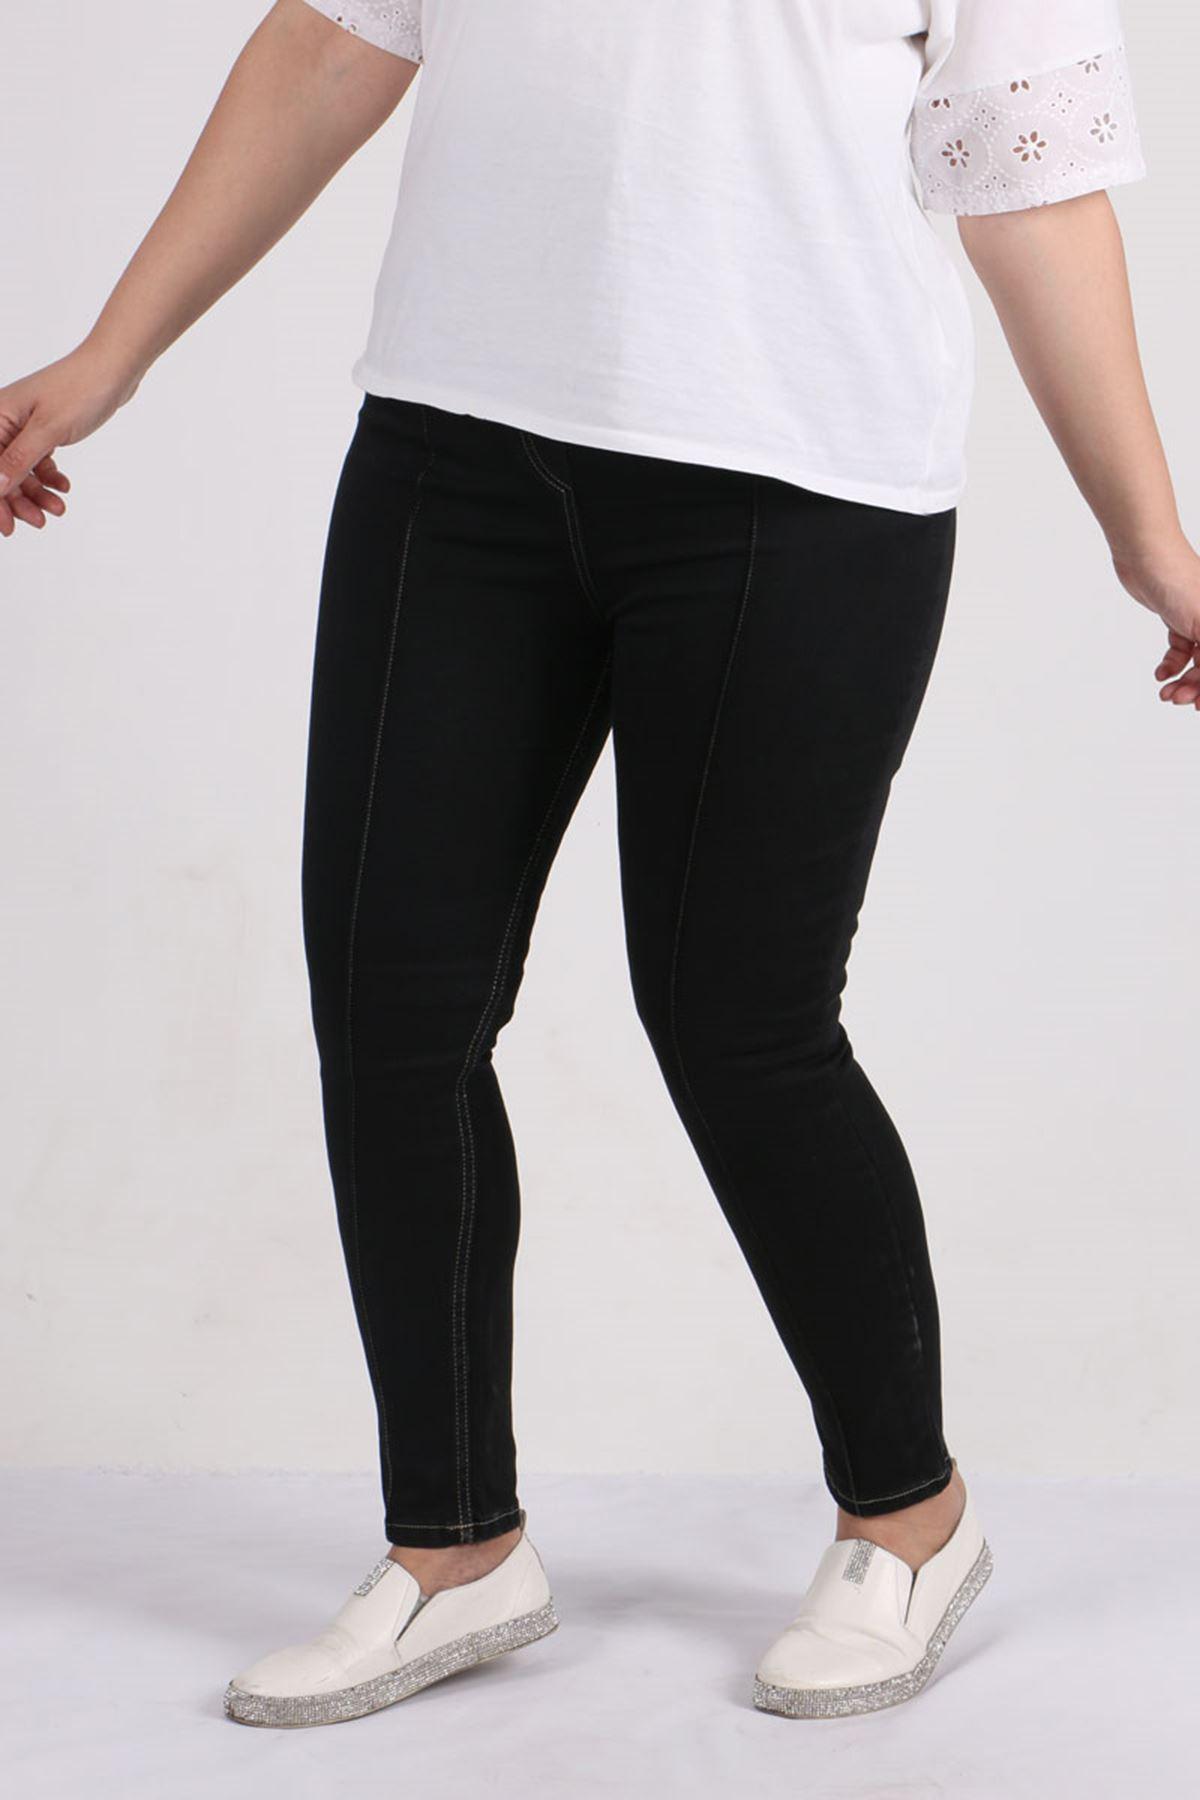 9127 Plus Size Skinny Leg Jeans- Black